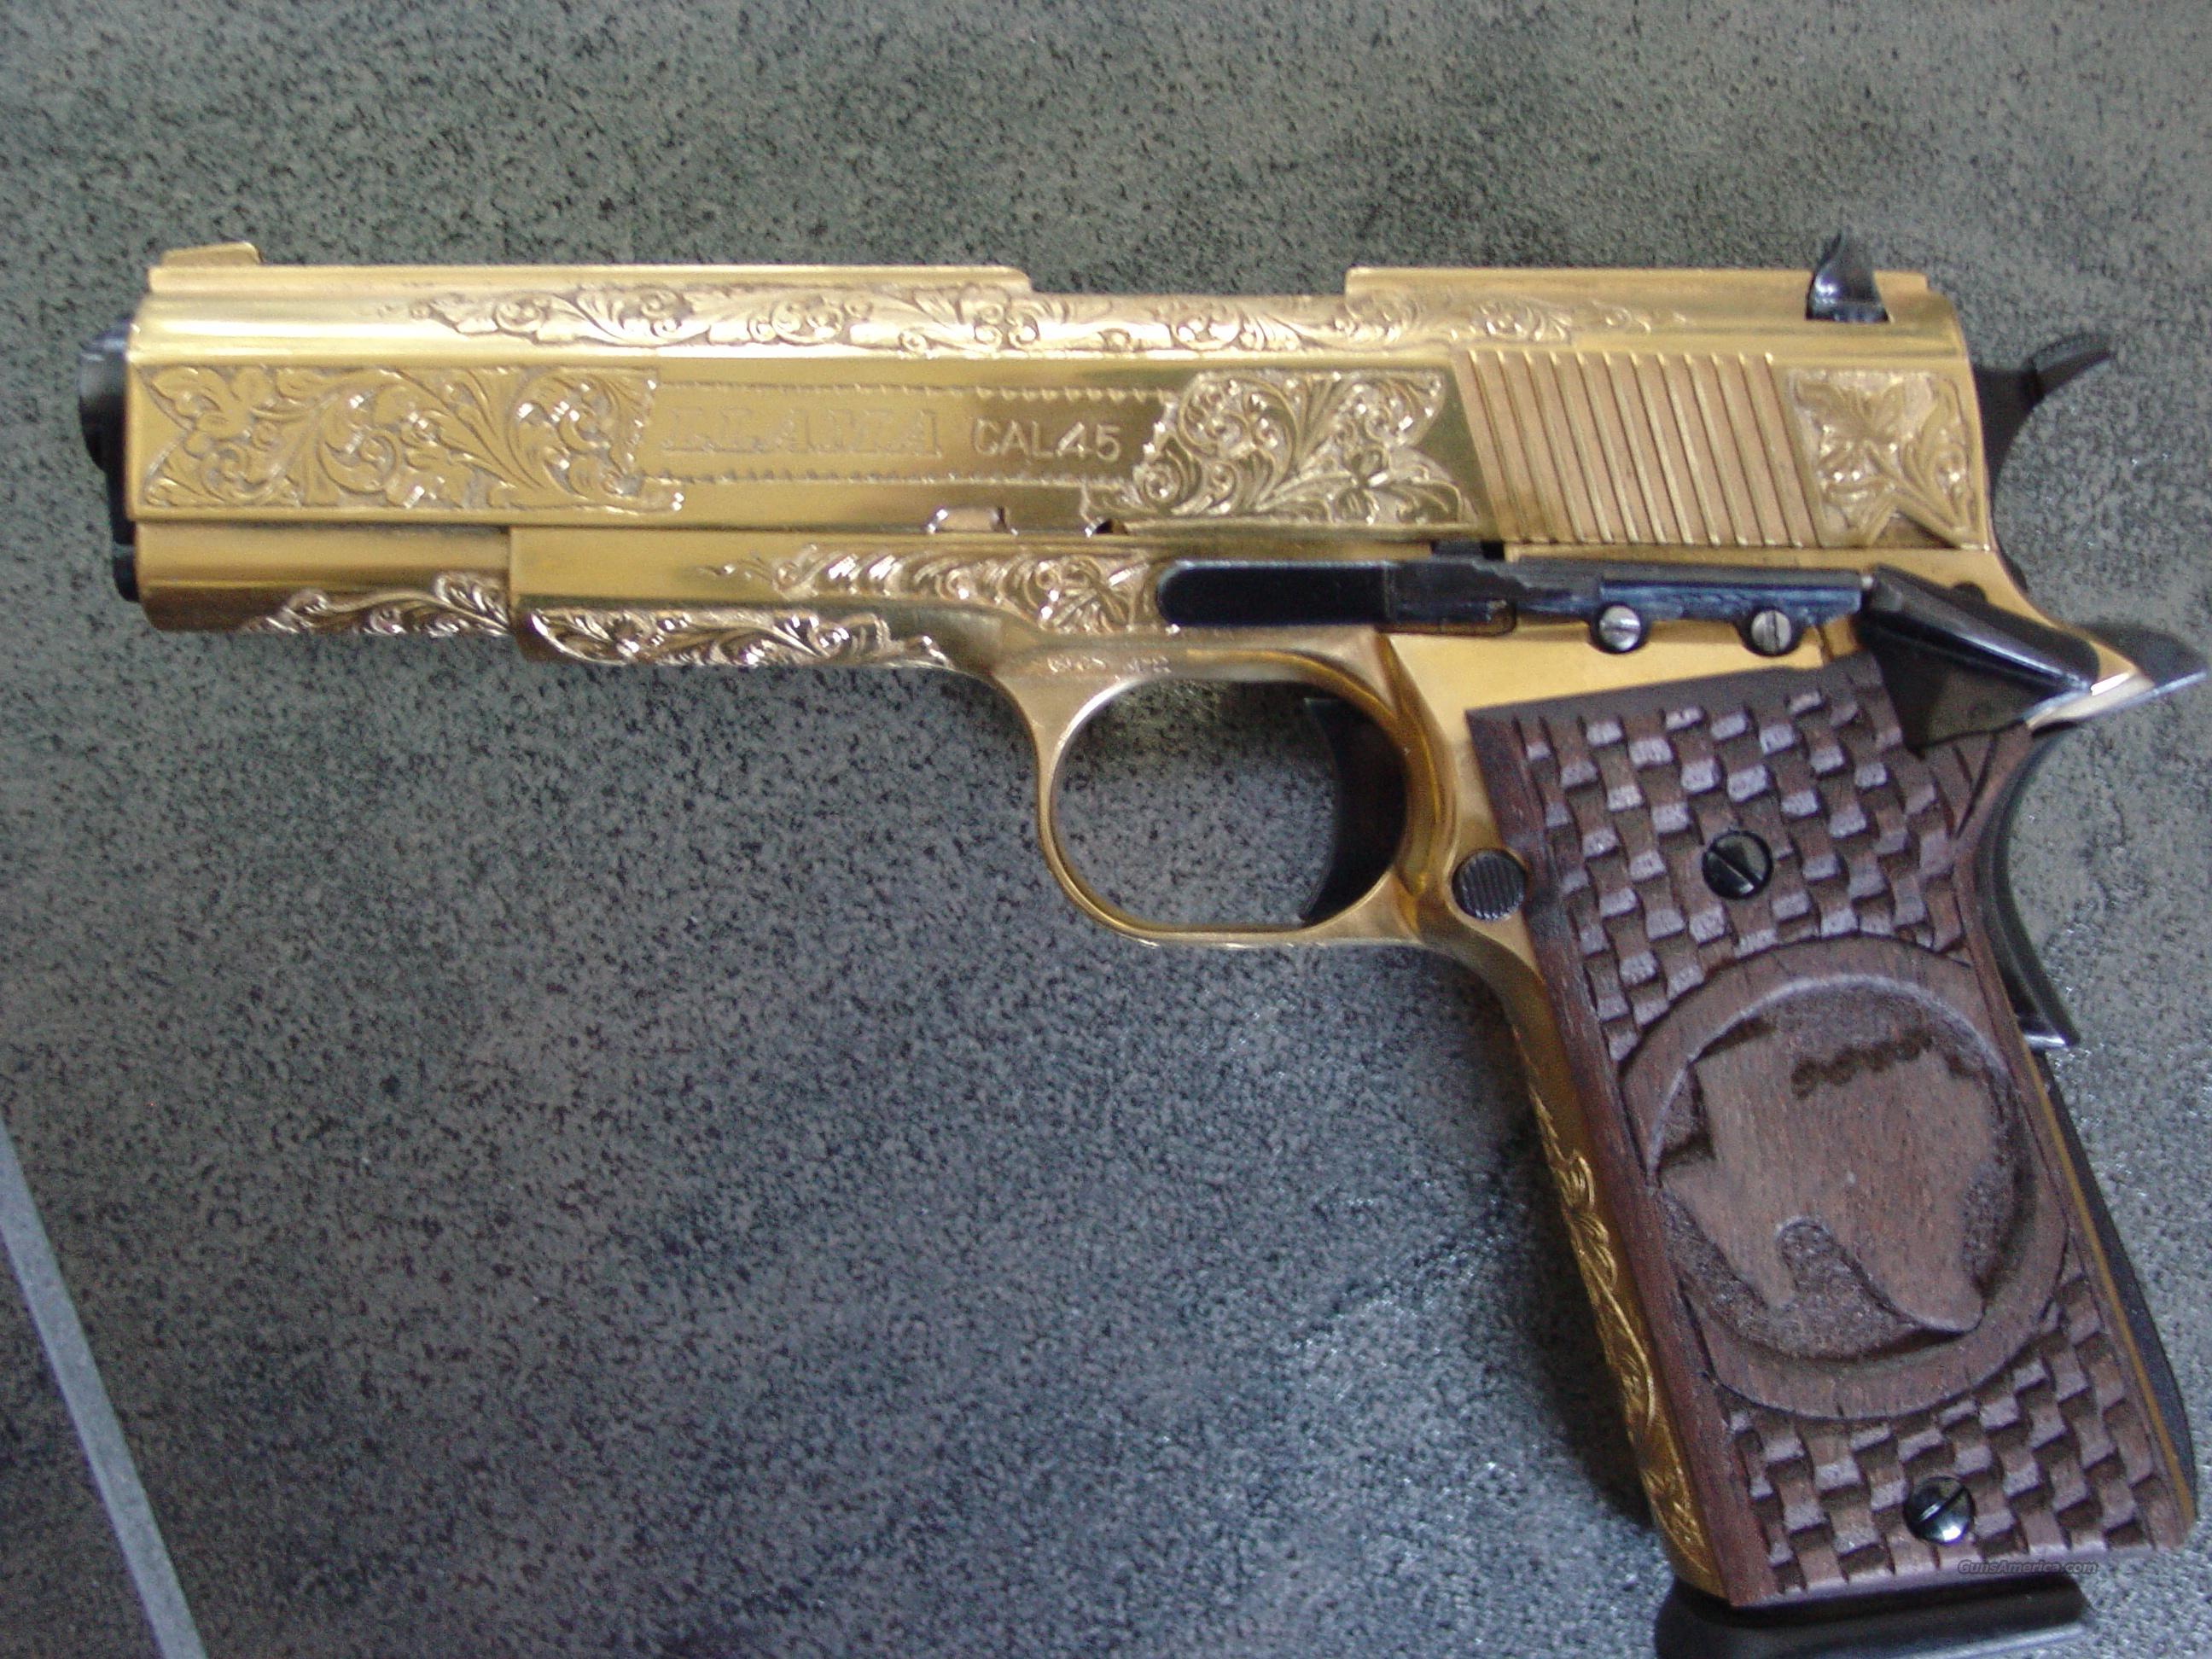 Llama 45 acp,deep relief hand engraved,24K gold plated,custom Texas Mesquite